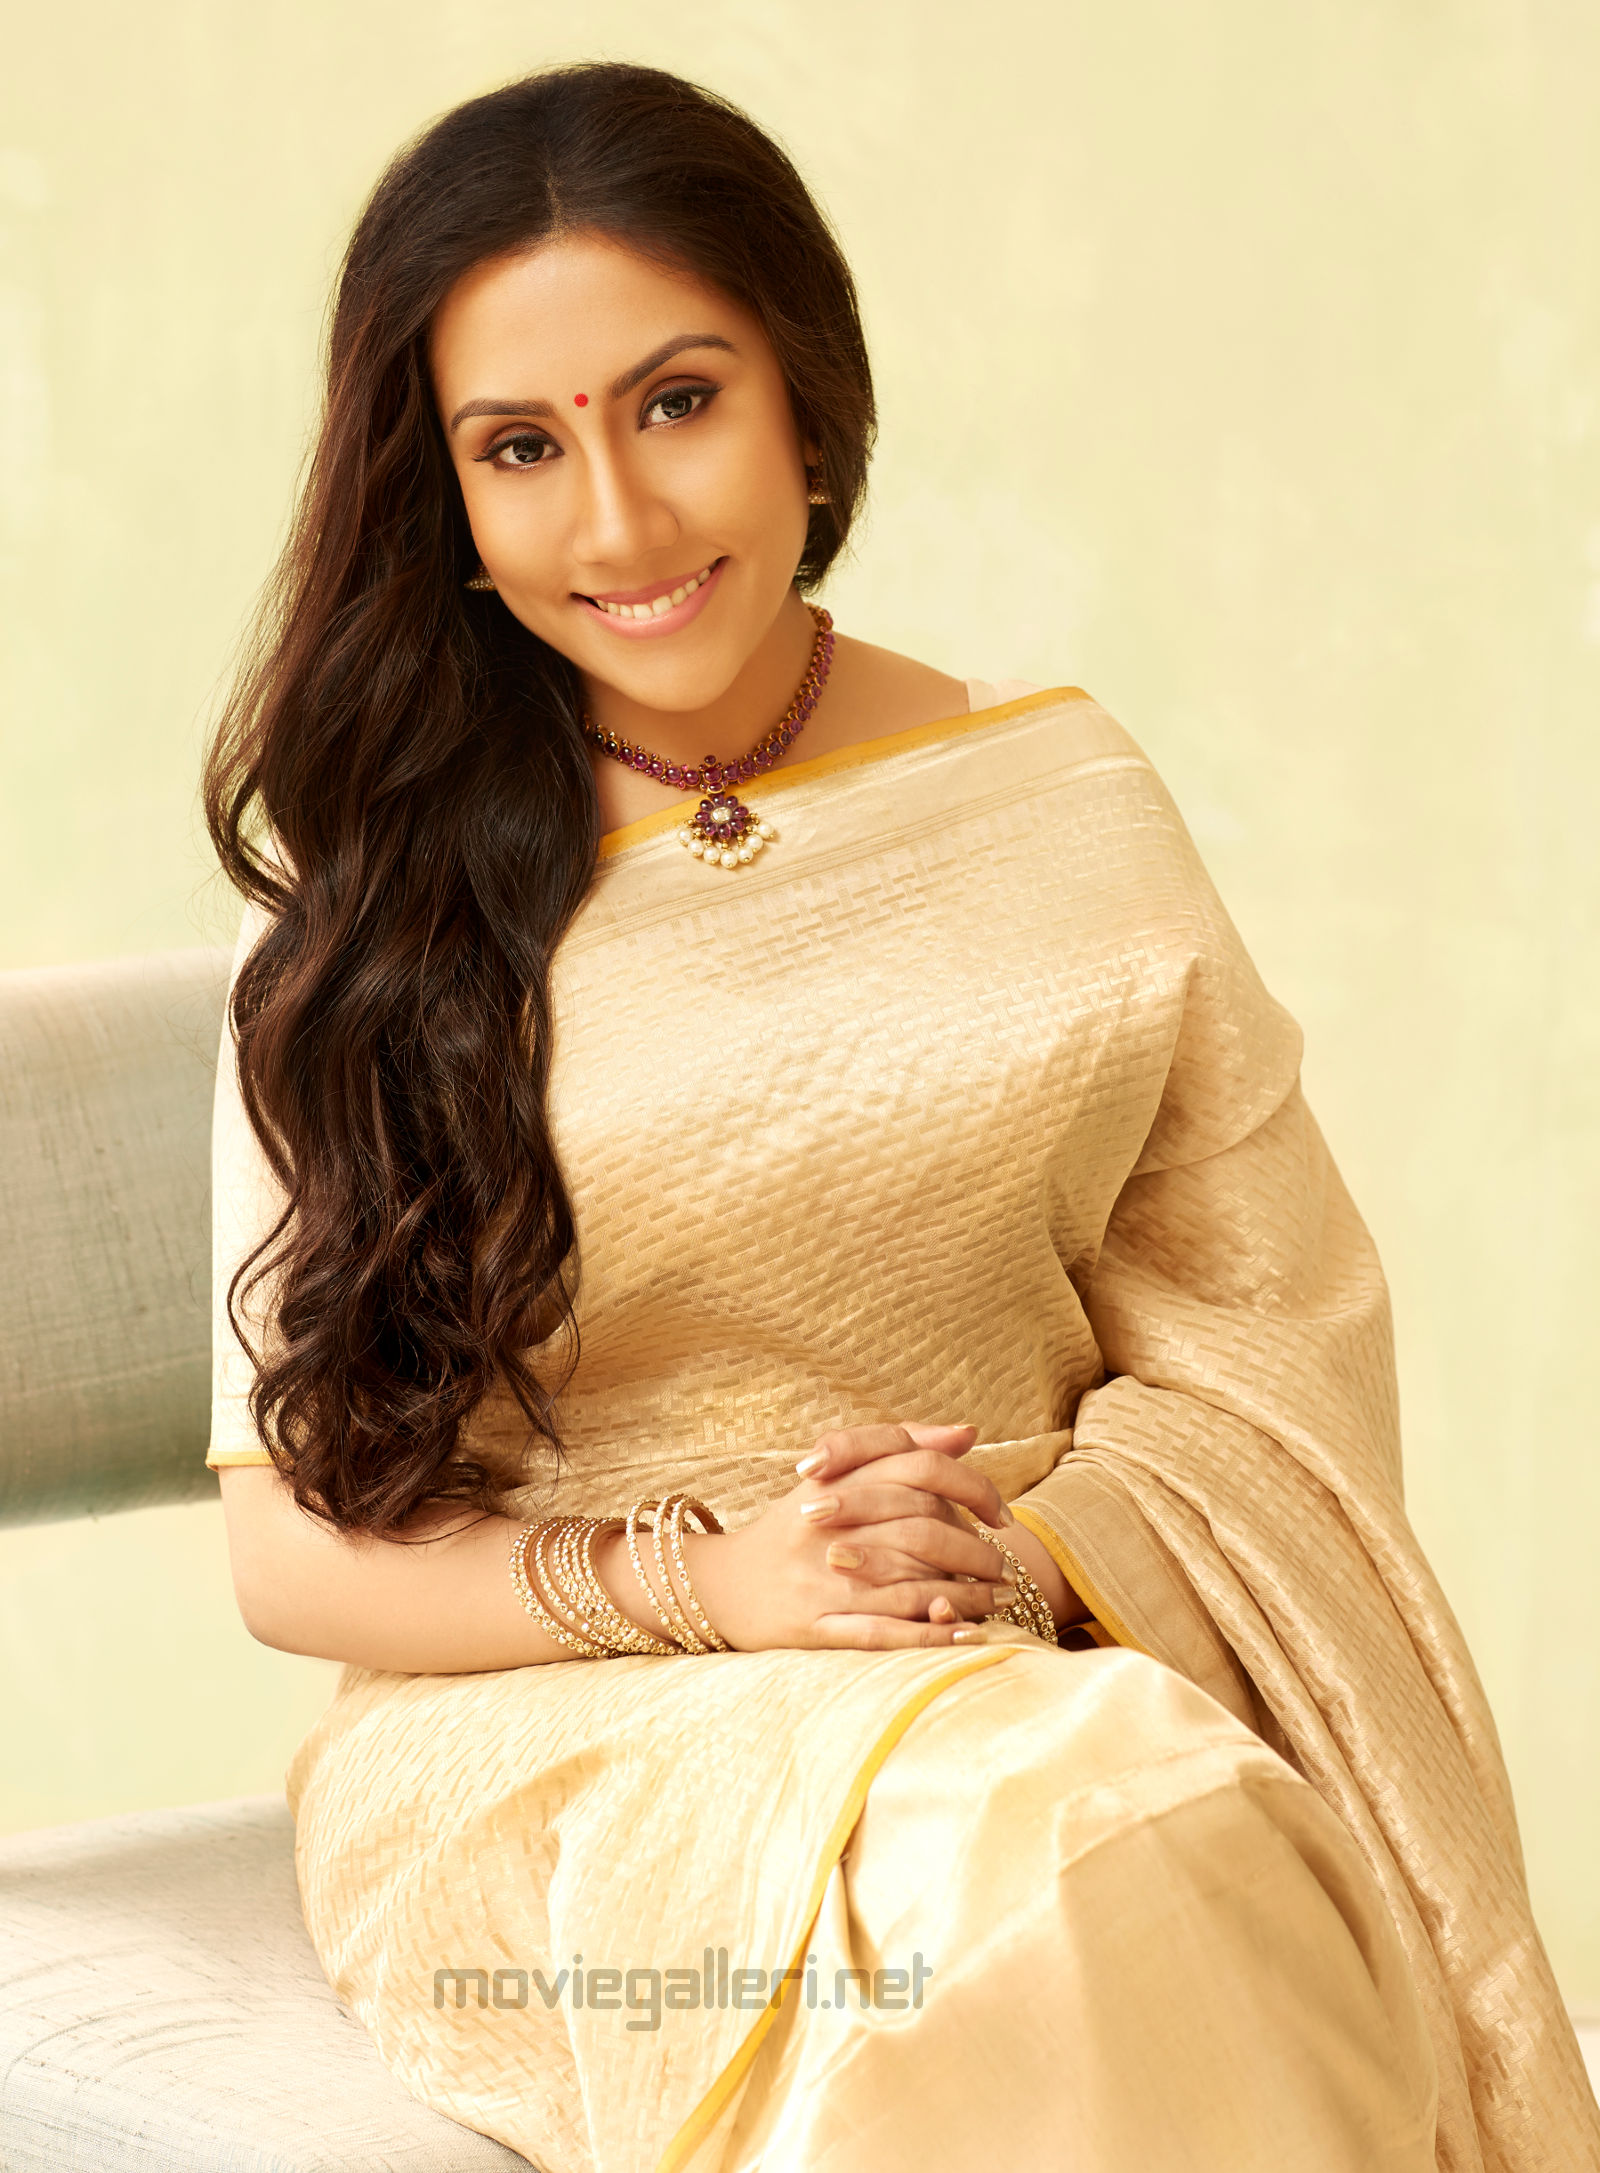 Ms.Divya Sathyaraj denied about her acting career